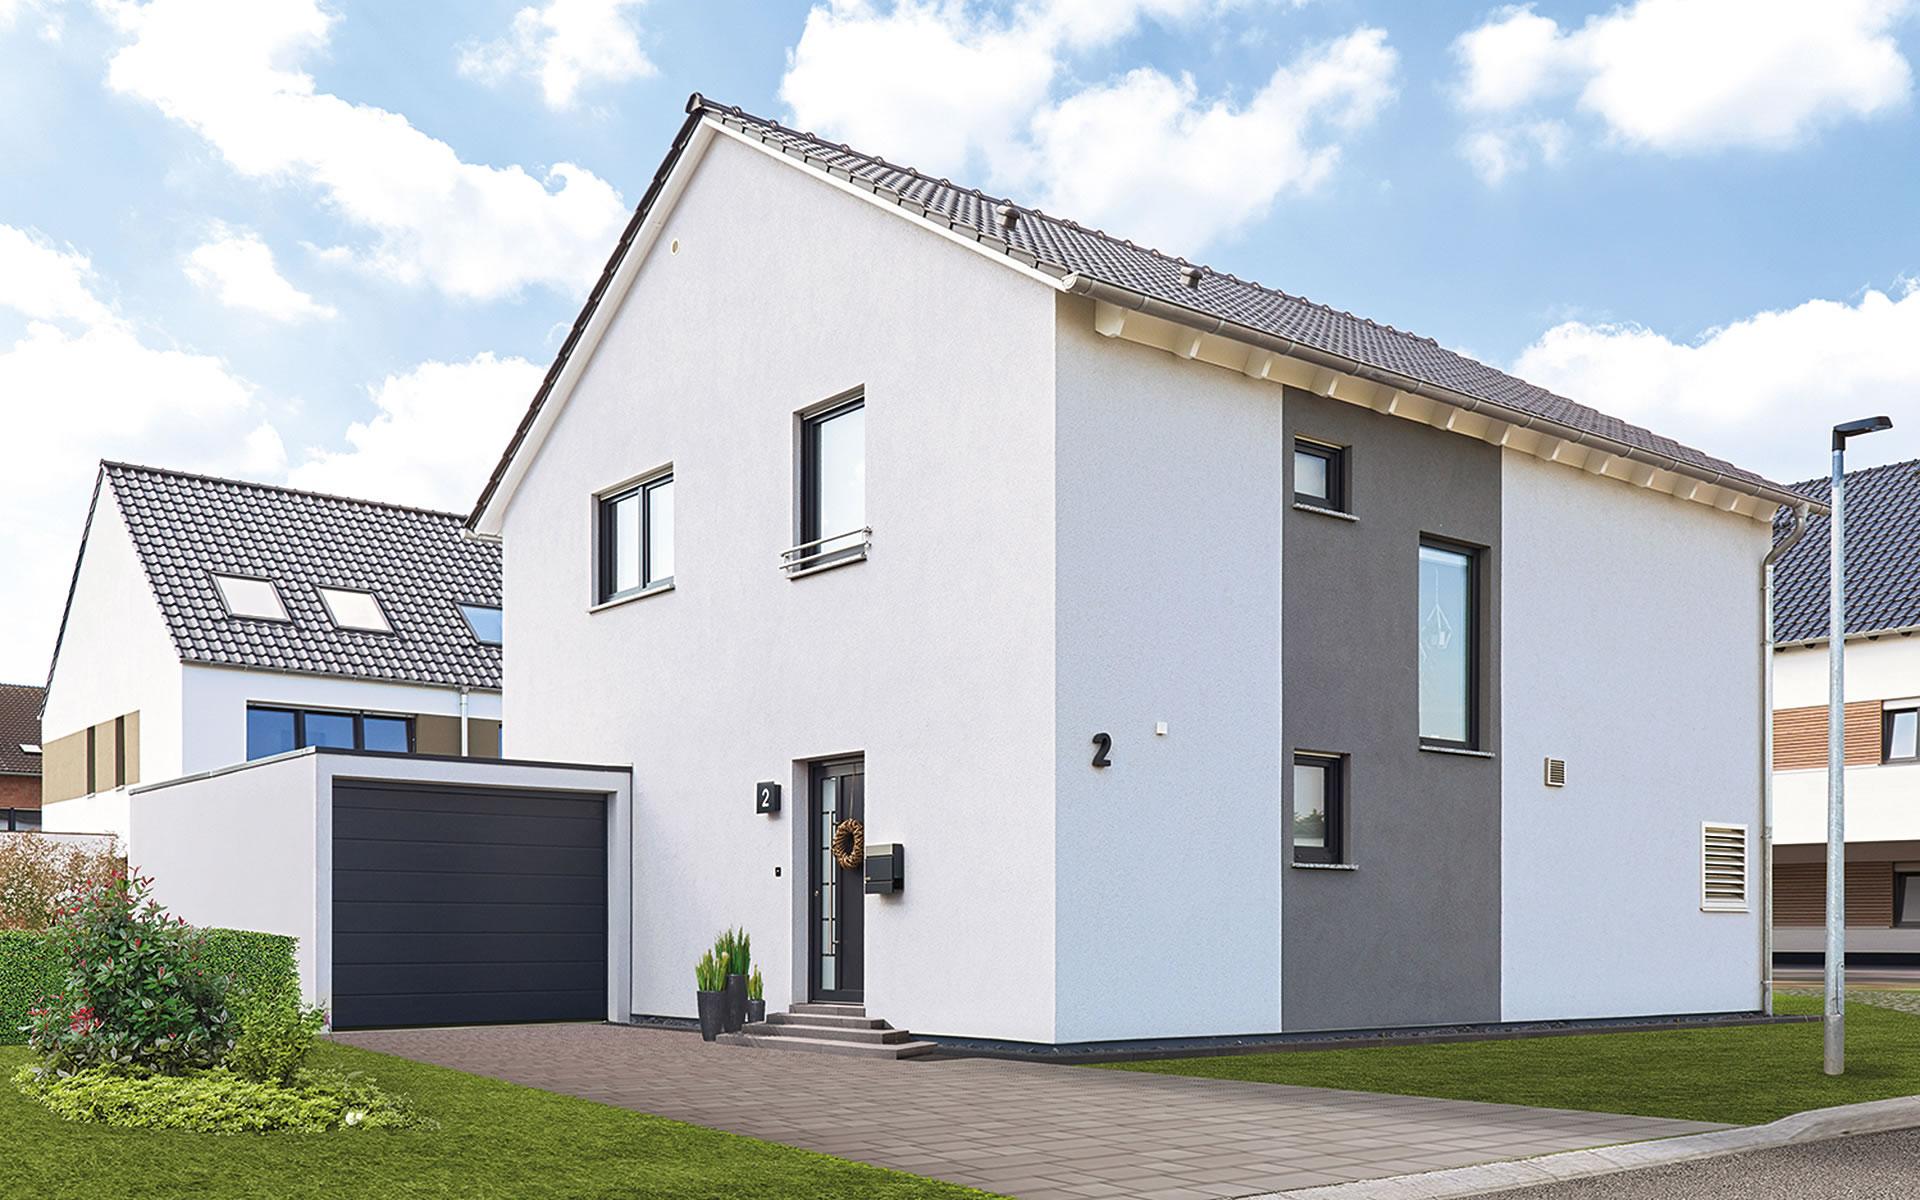 Juna - Fingerhut Haus GmbH & Co. KG